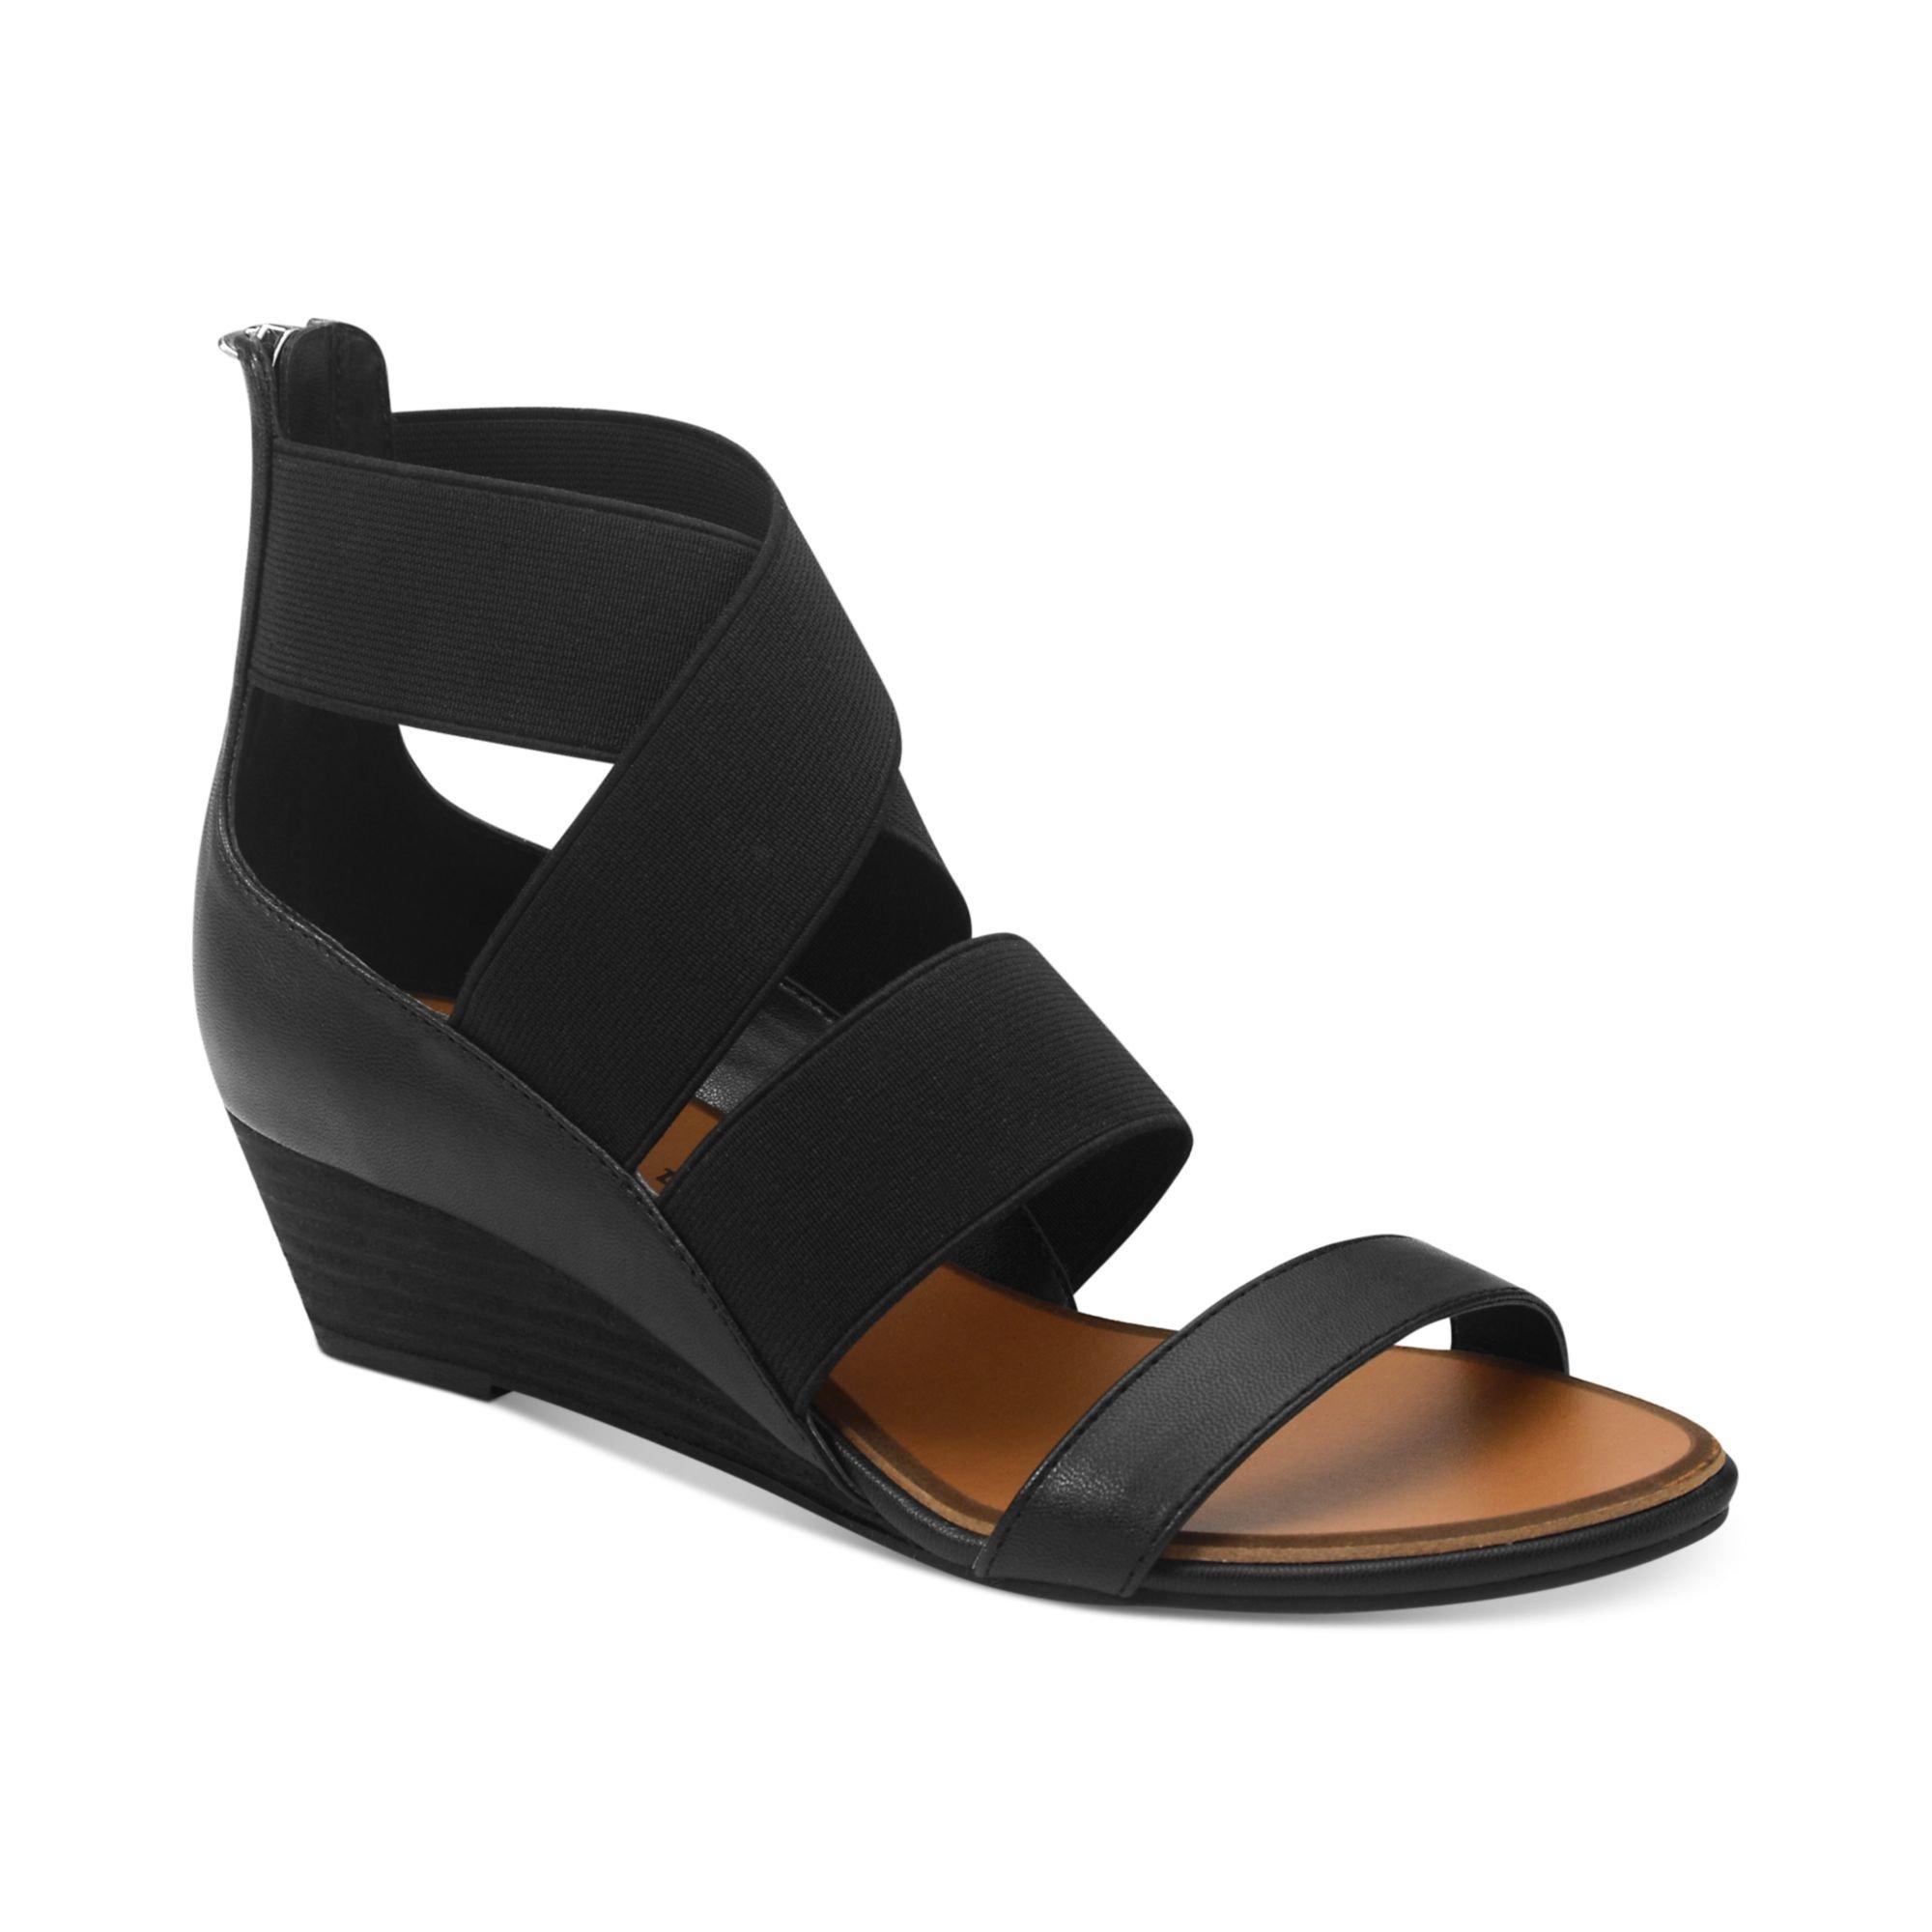 James Taylor Shoes Review